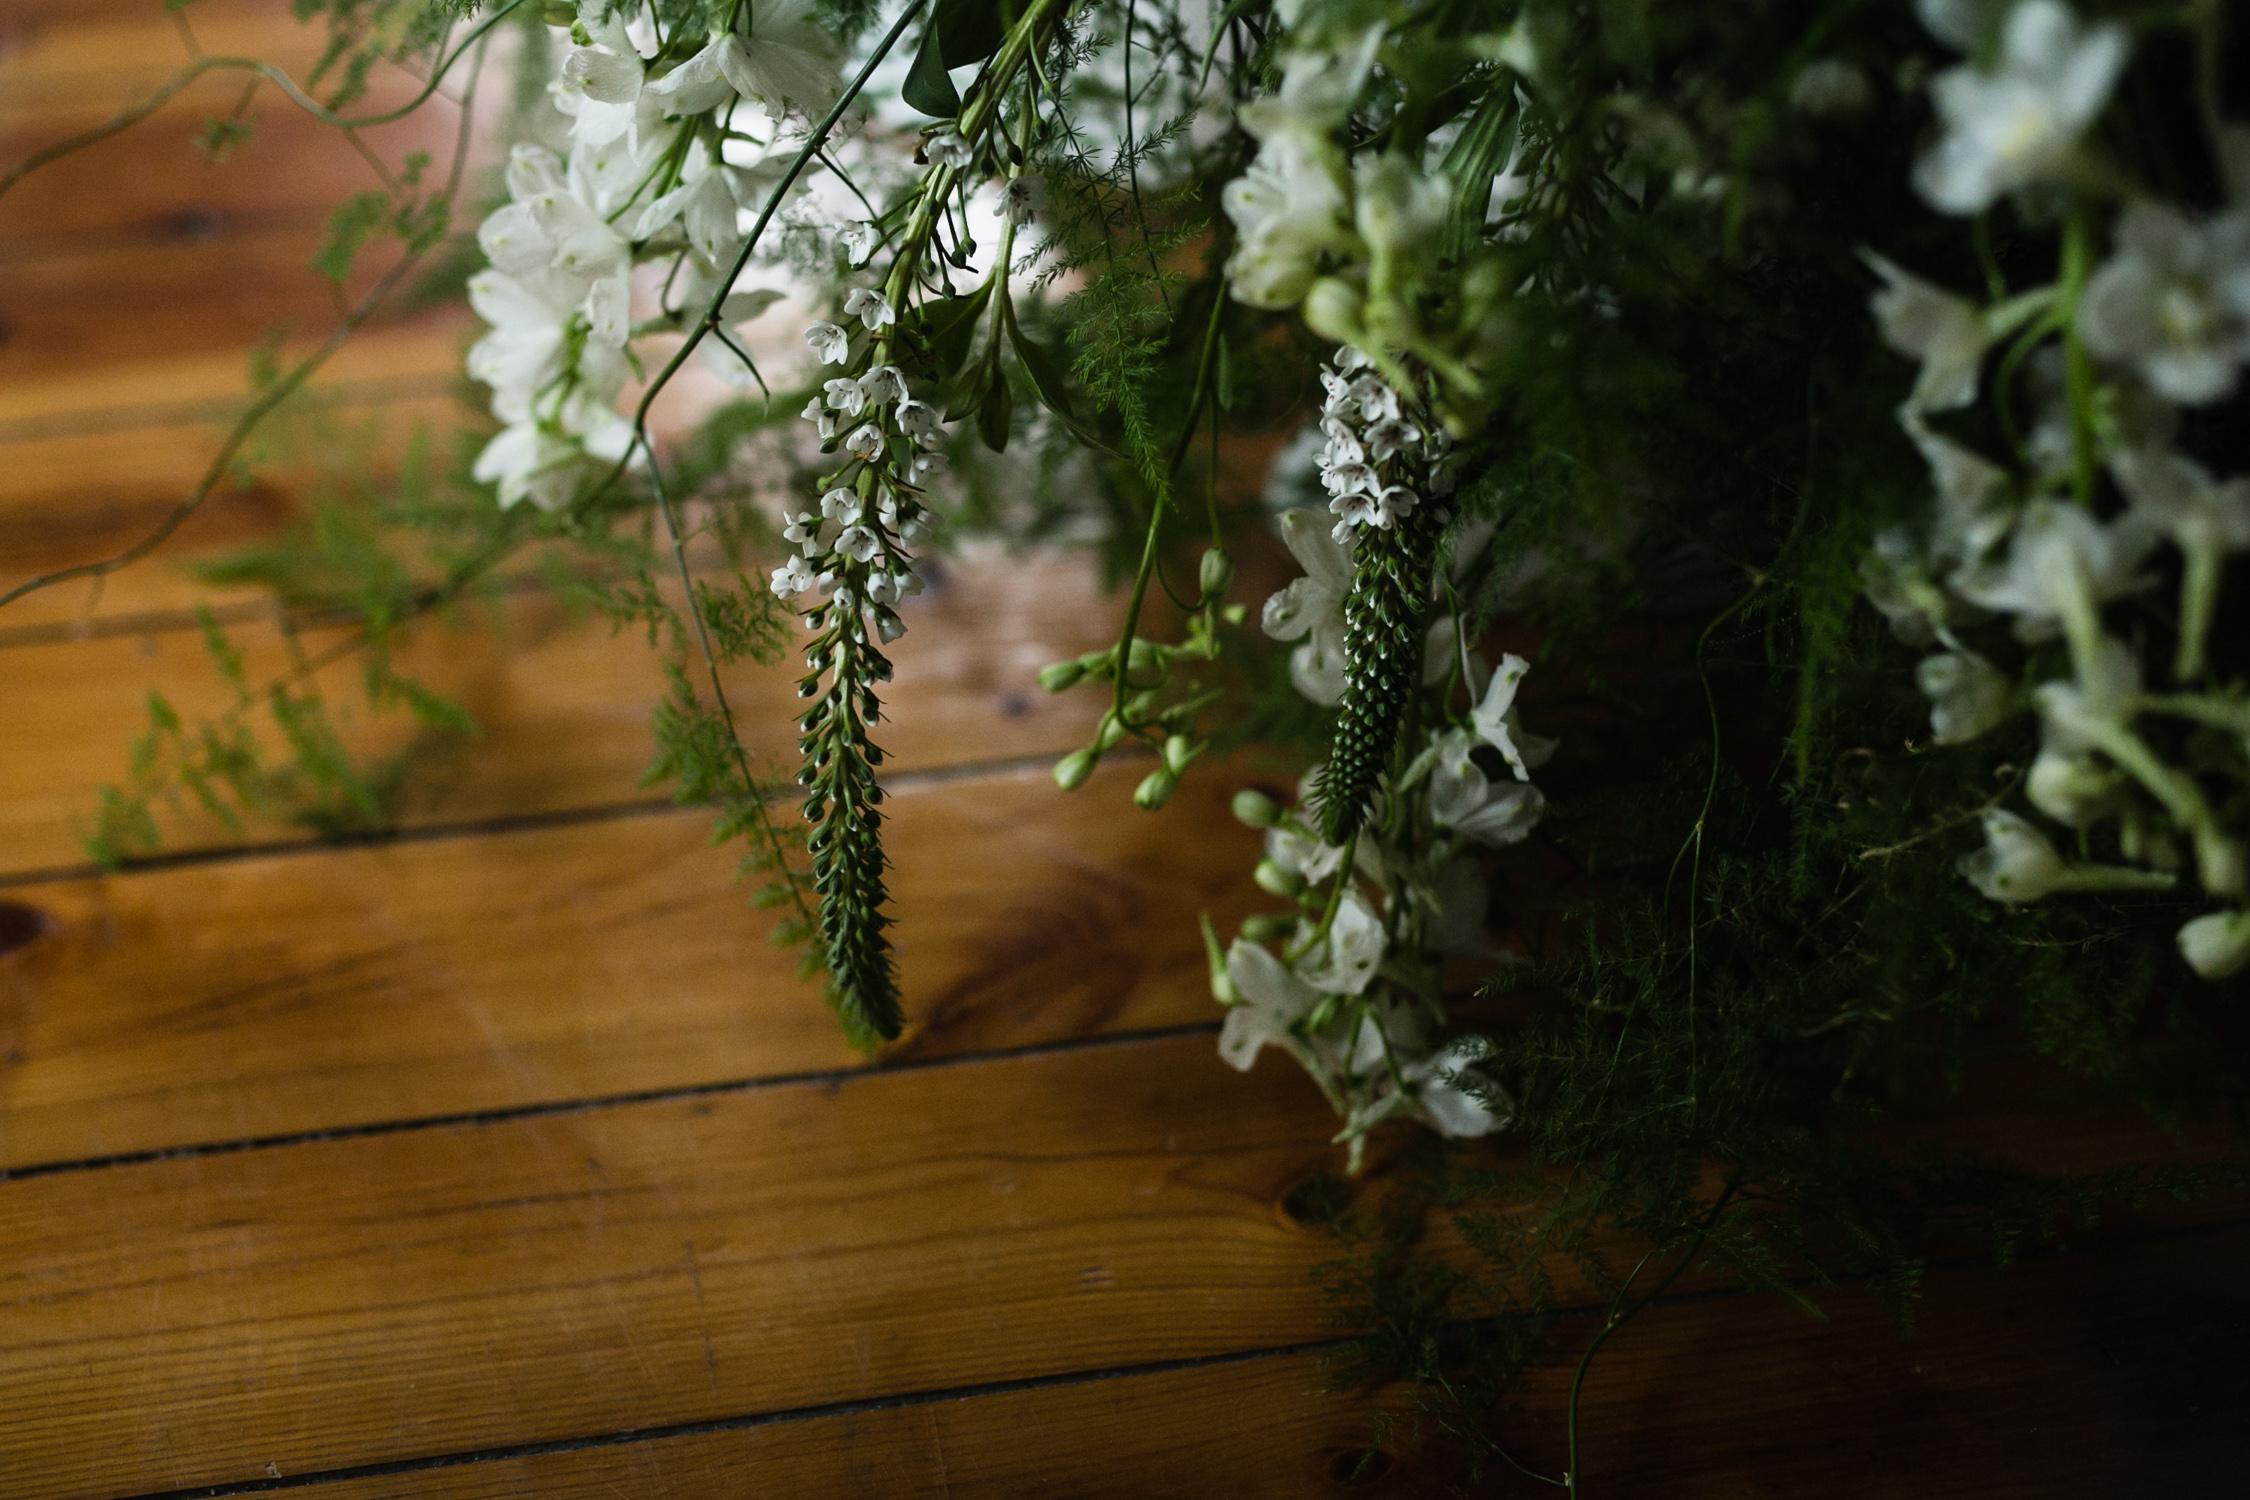 heisvisual-wedding-photographers-documentary-midlands-south-africa032.jpg